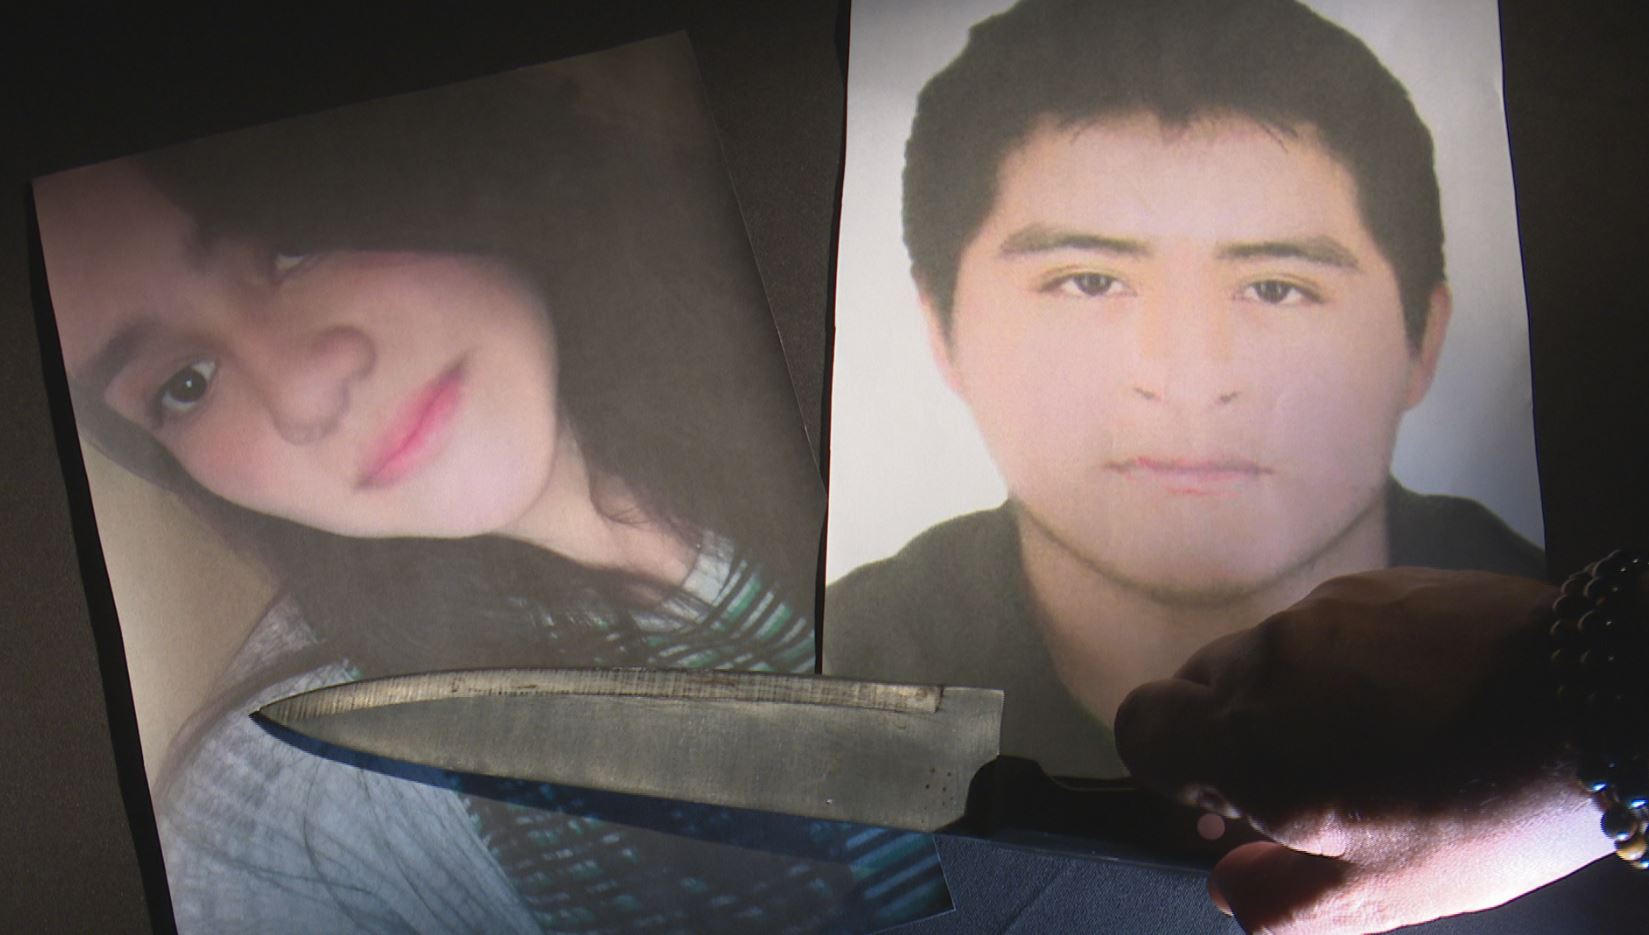 Asesinó a la madre de sus dos hijos: La coartada del feminicida de San Juan de Miraflores